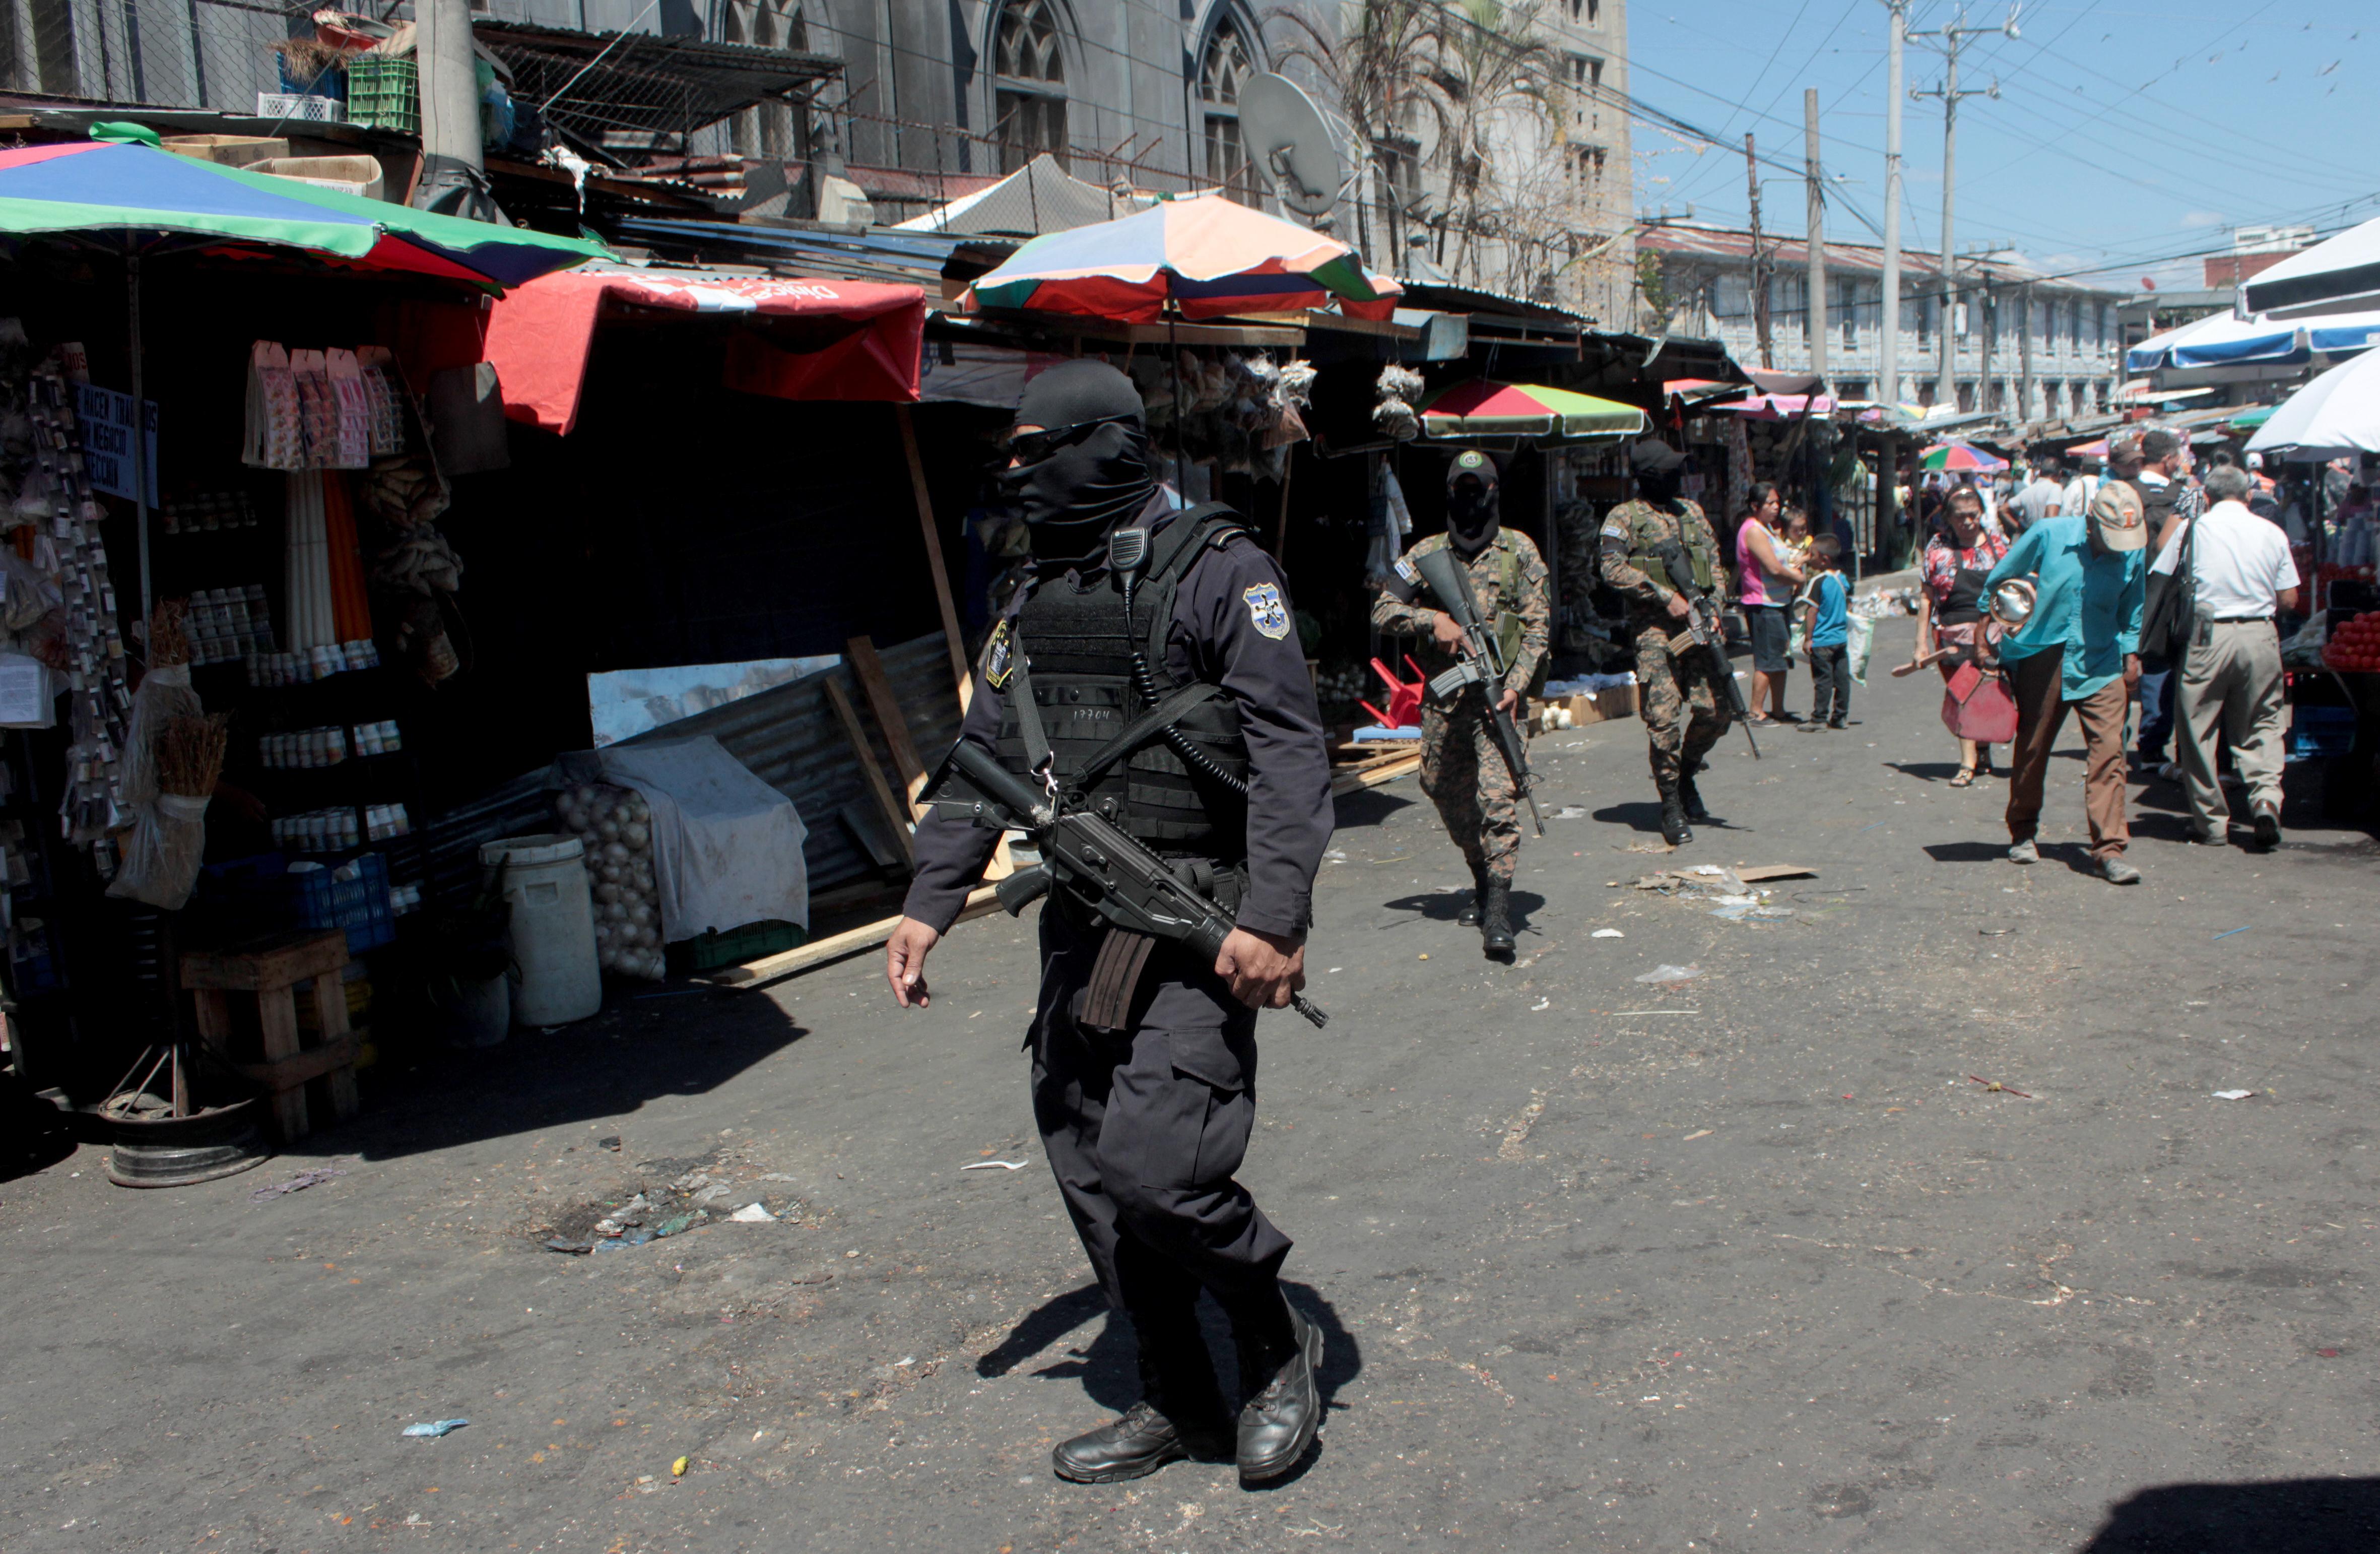 Asamblea avala bono trimestral para agentes de seguridad pública